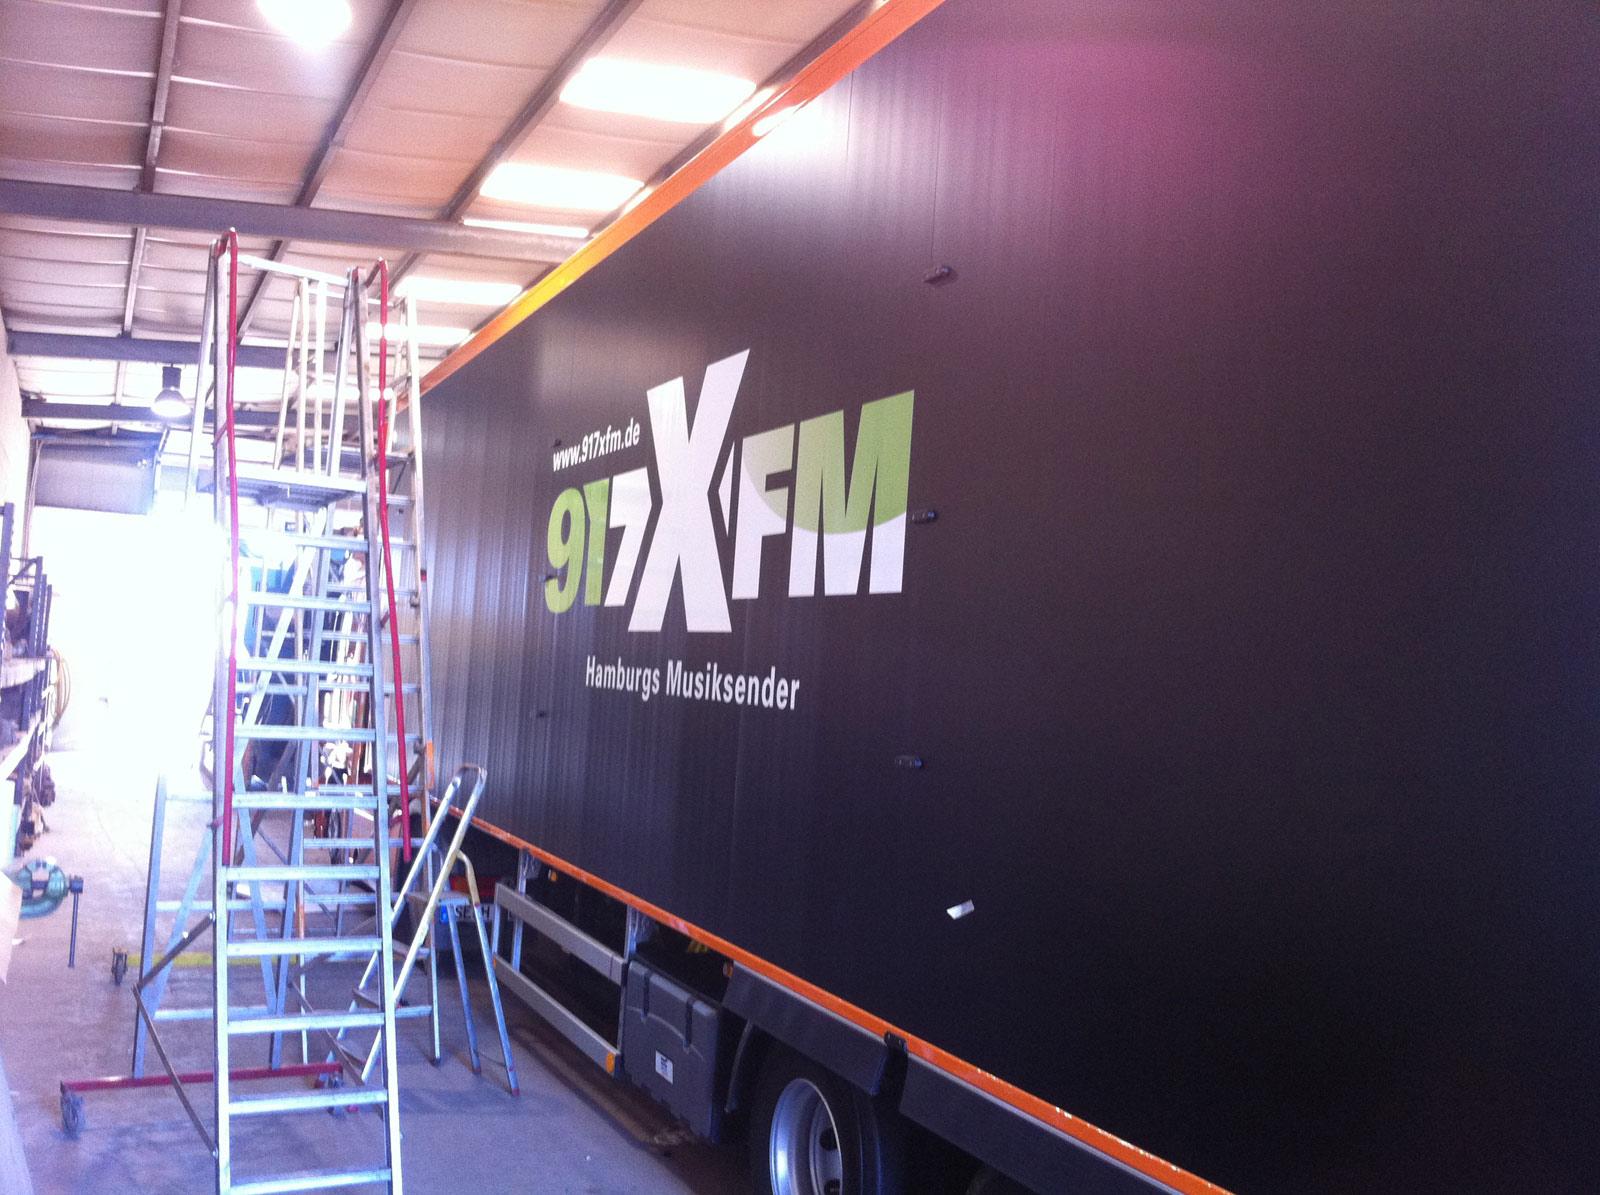 917XFM LKW Folierung.